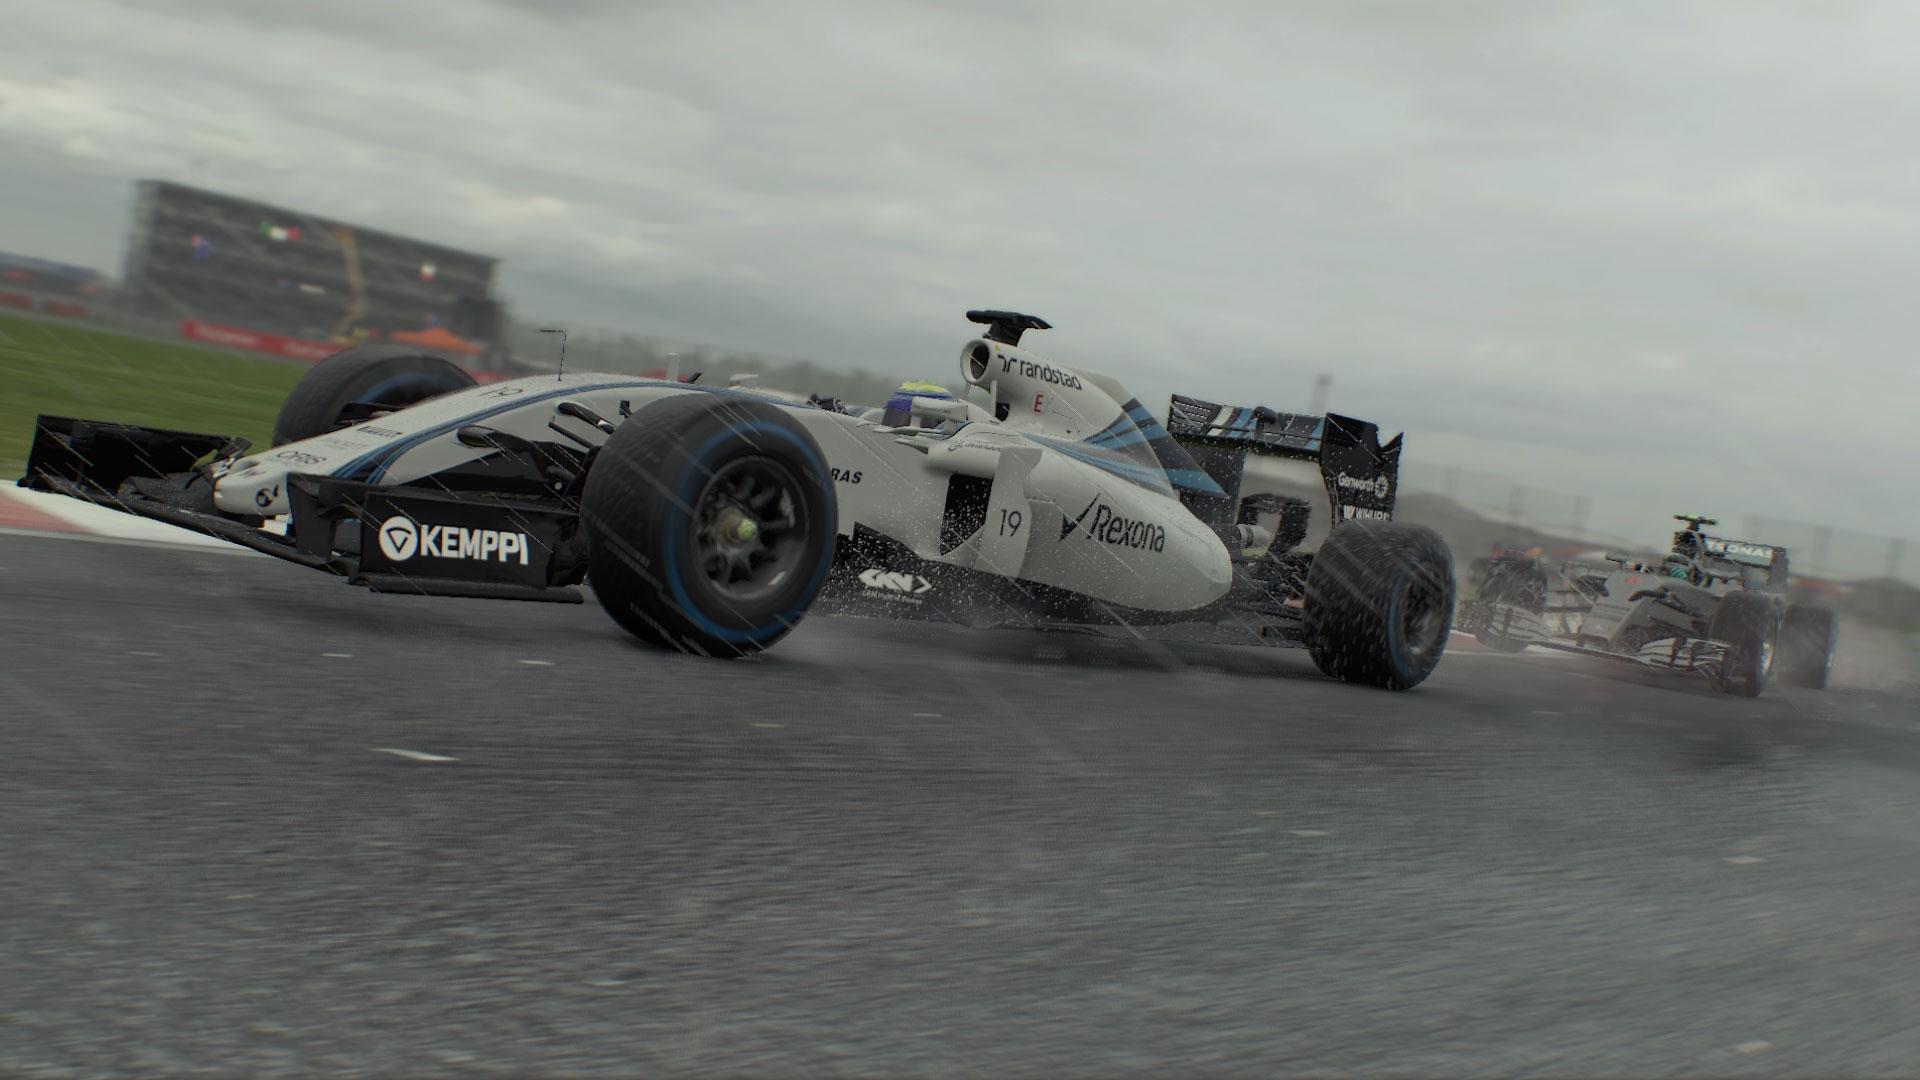 Codemasters_F1_2015_Silverstone_5